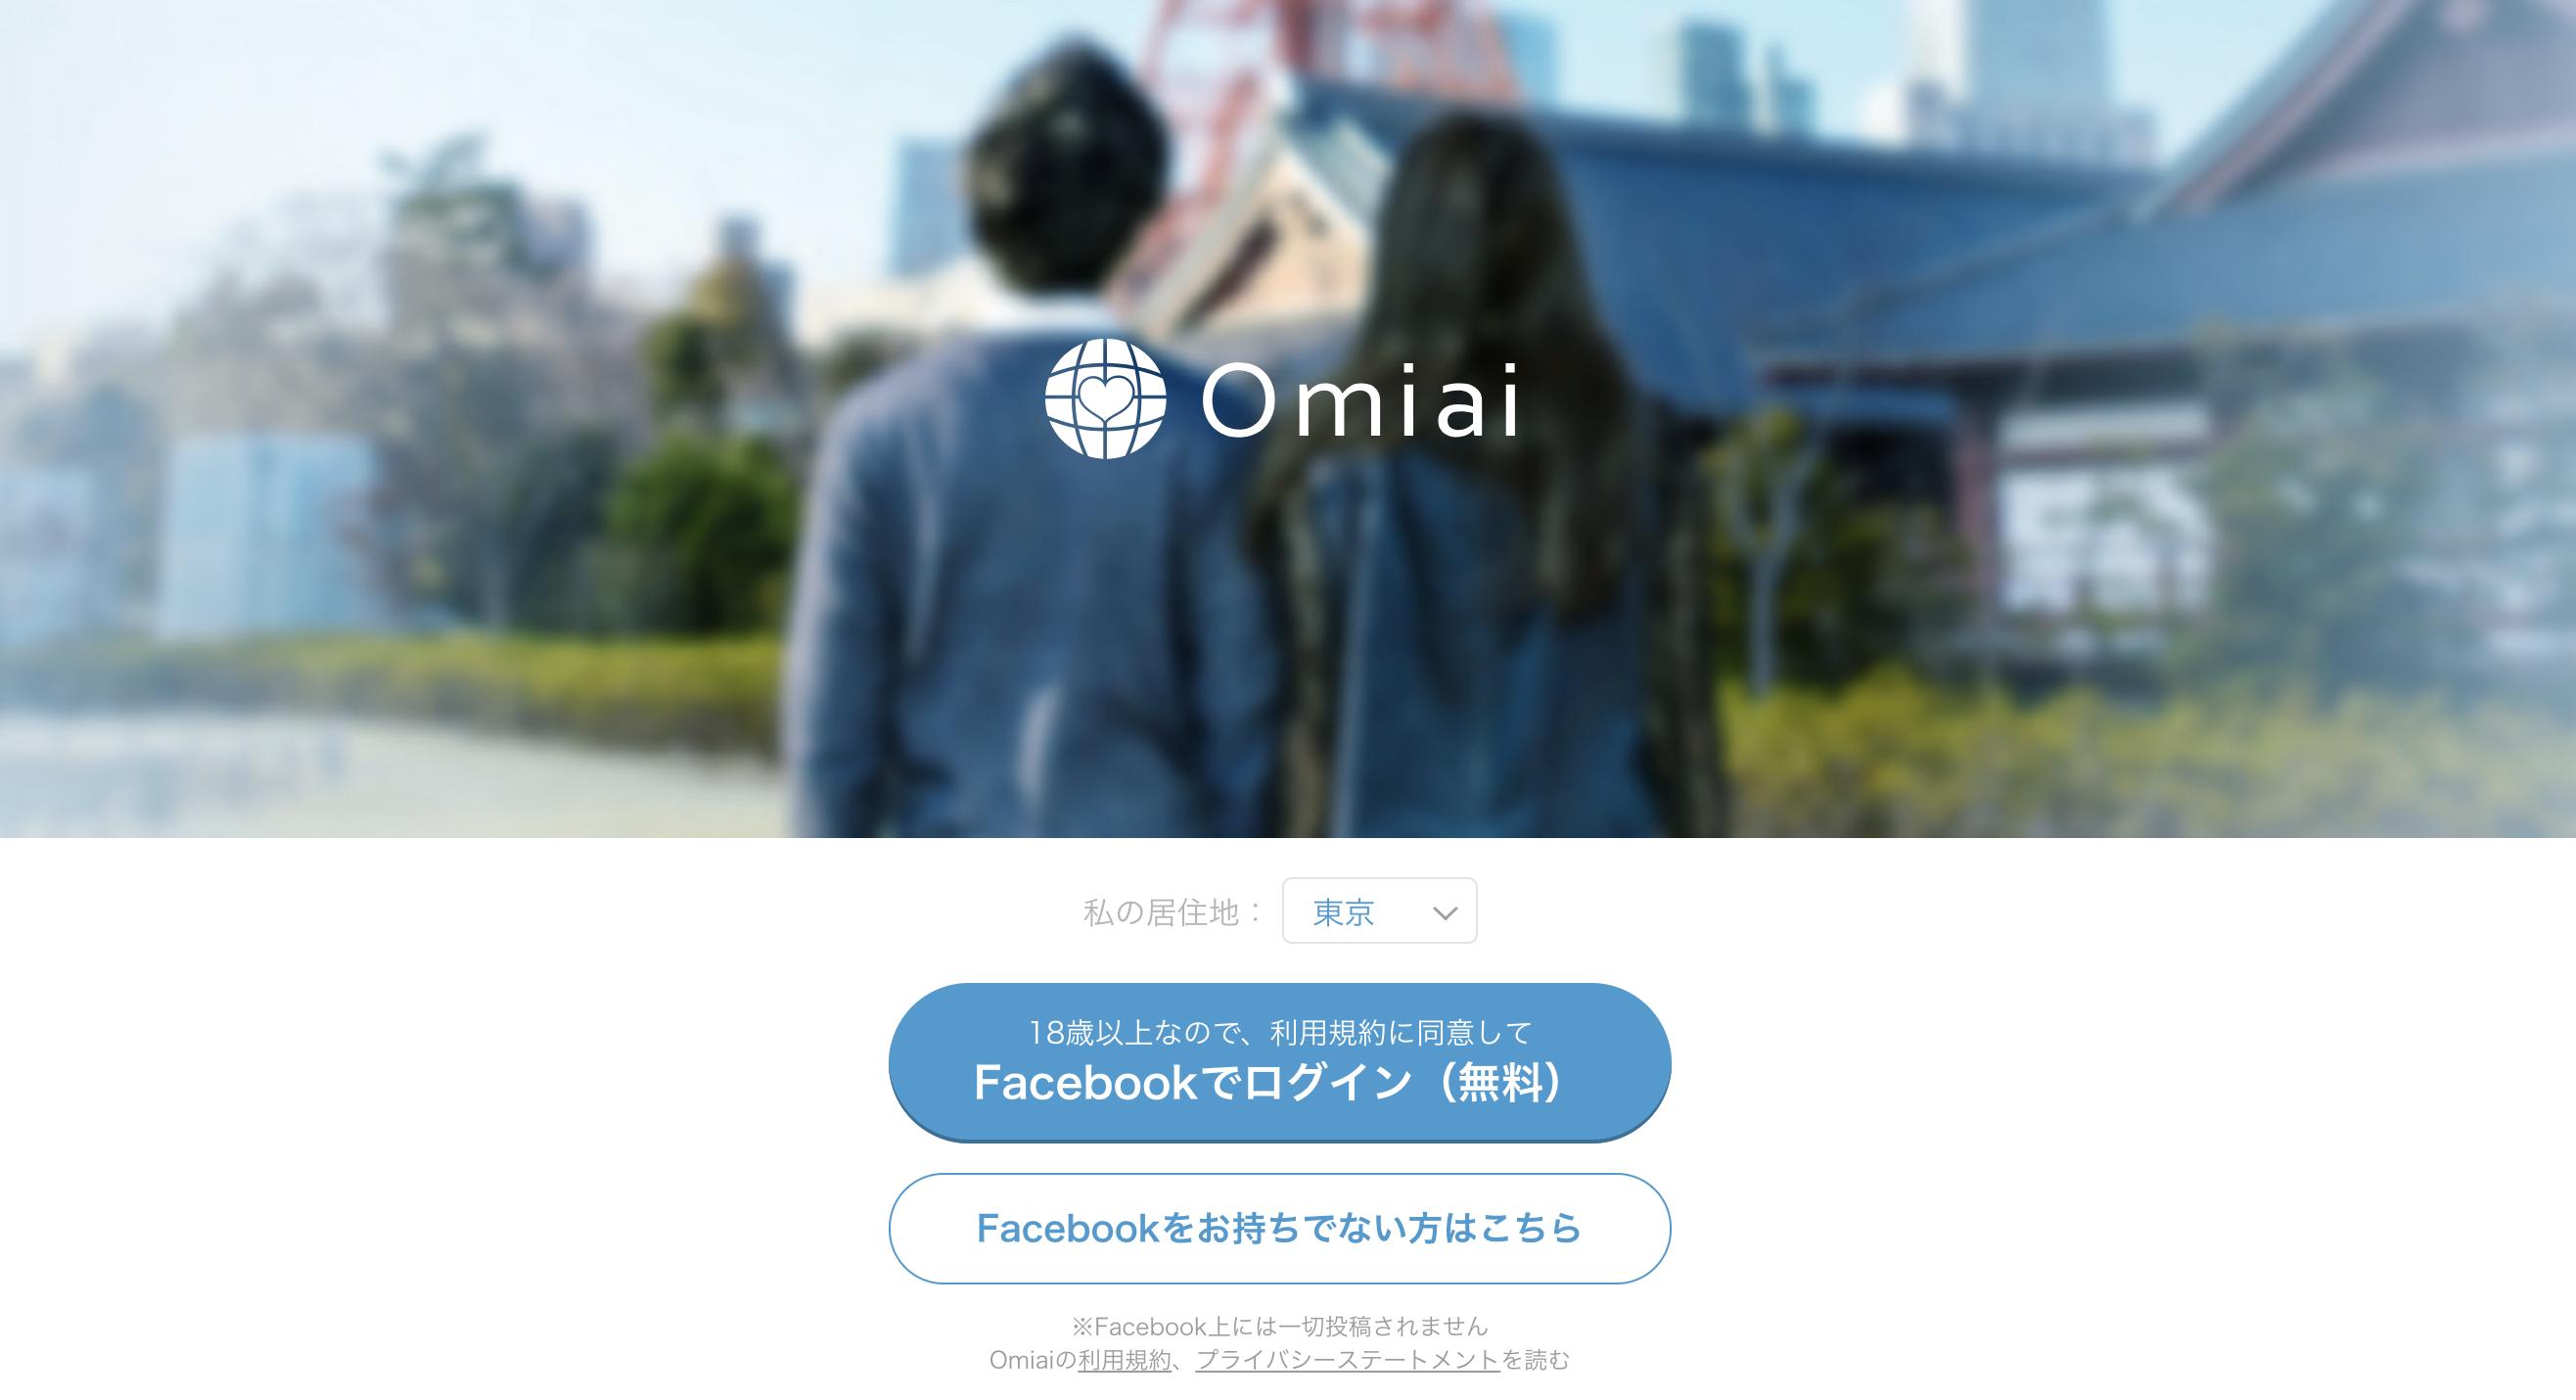 Omiai パソコンwebからの再登録方法